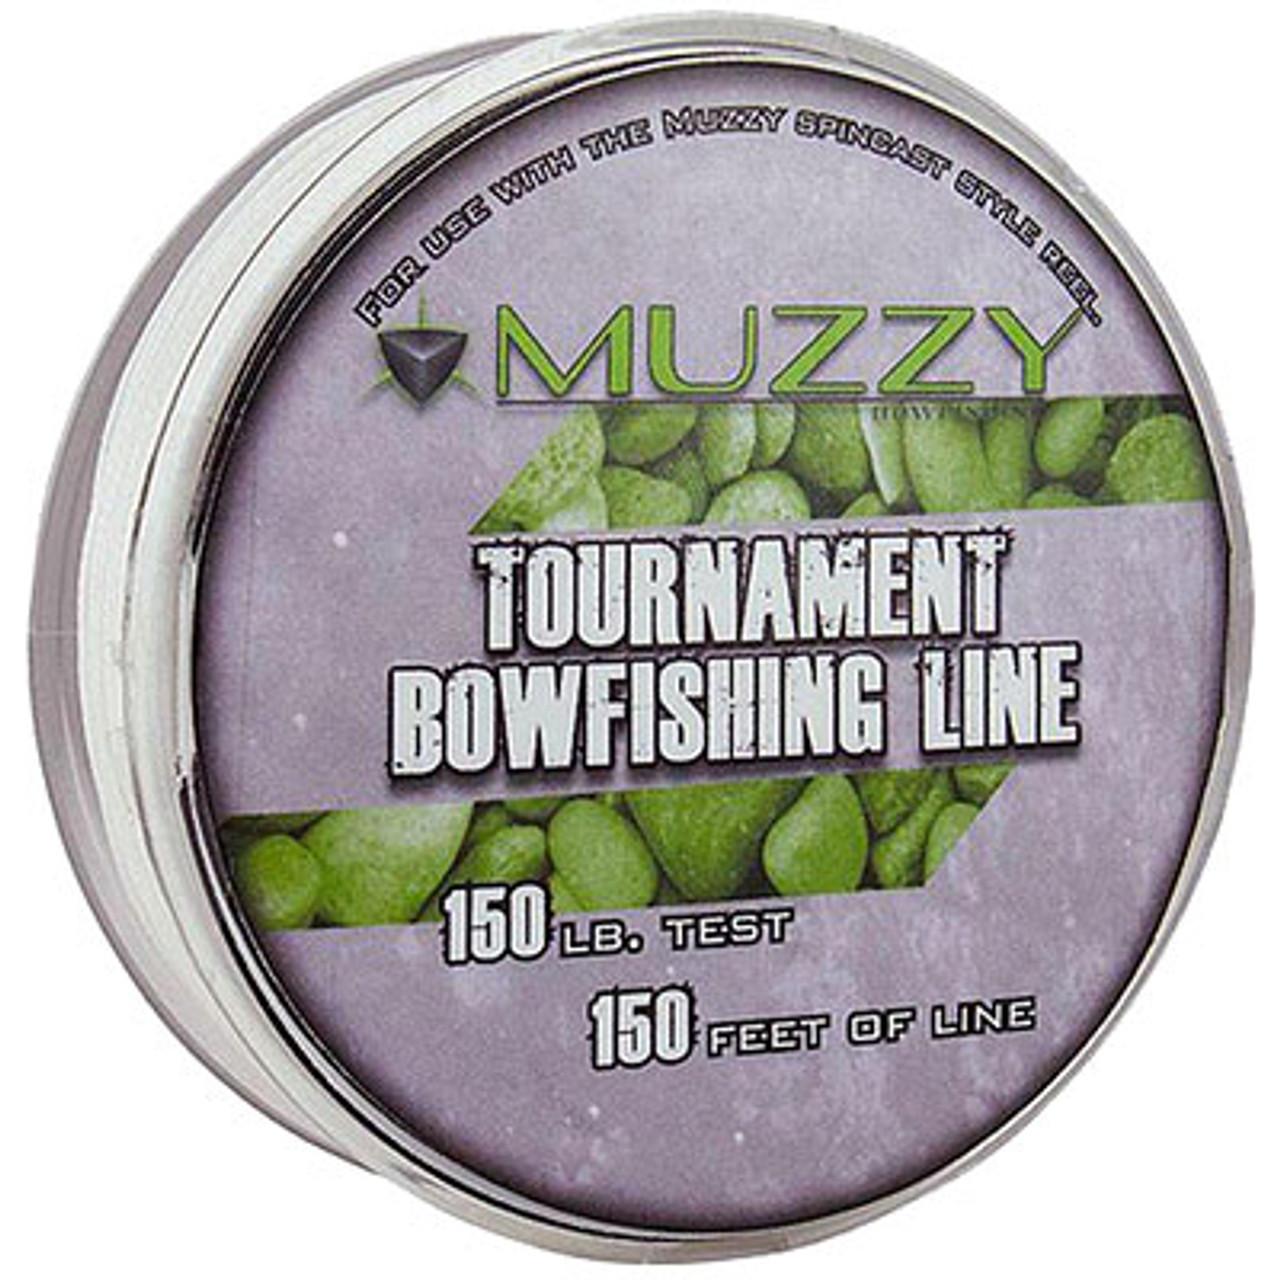 Tournament 150# White Bowfishing Line by Muzzy